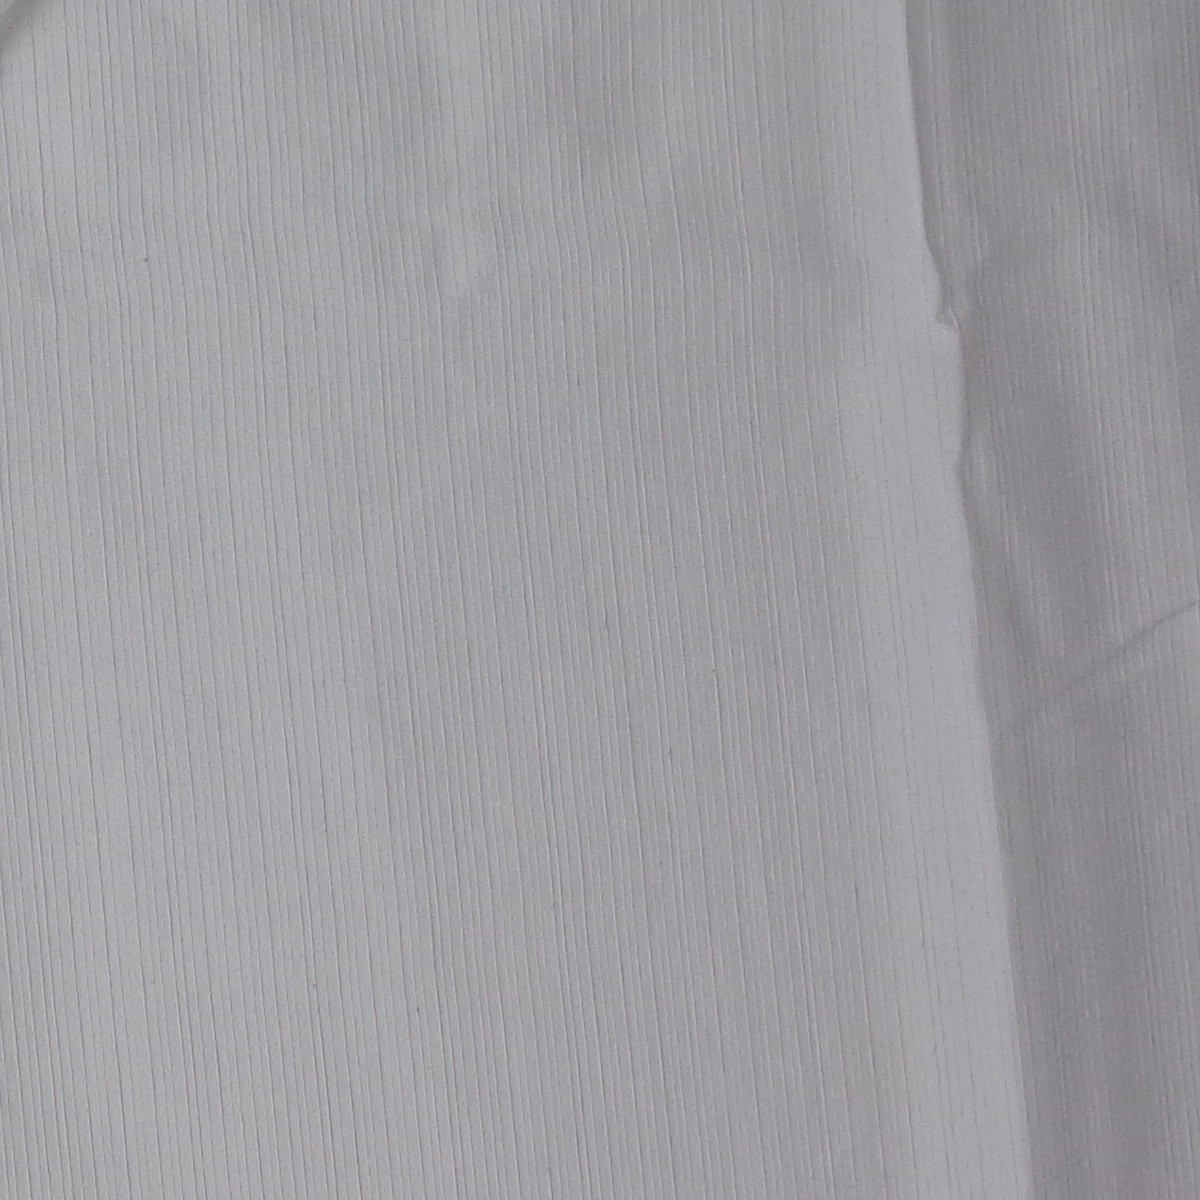 Cortina para Varão 260X170cm Rústica Pantex Bella Janela Cru